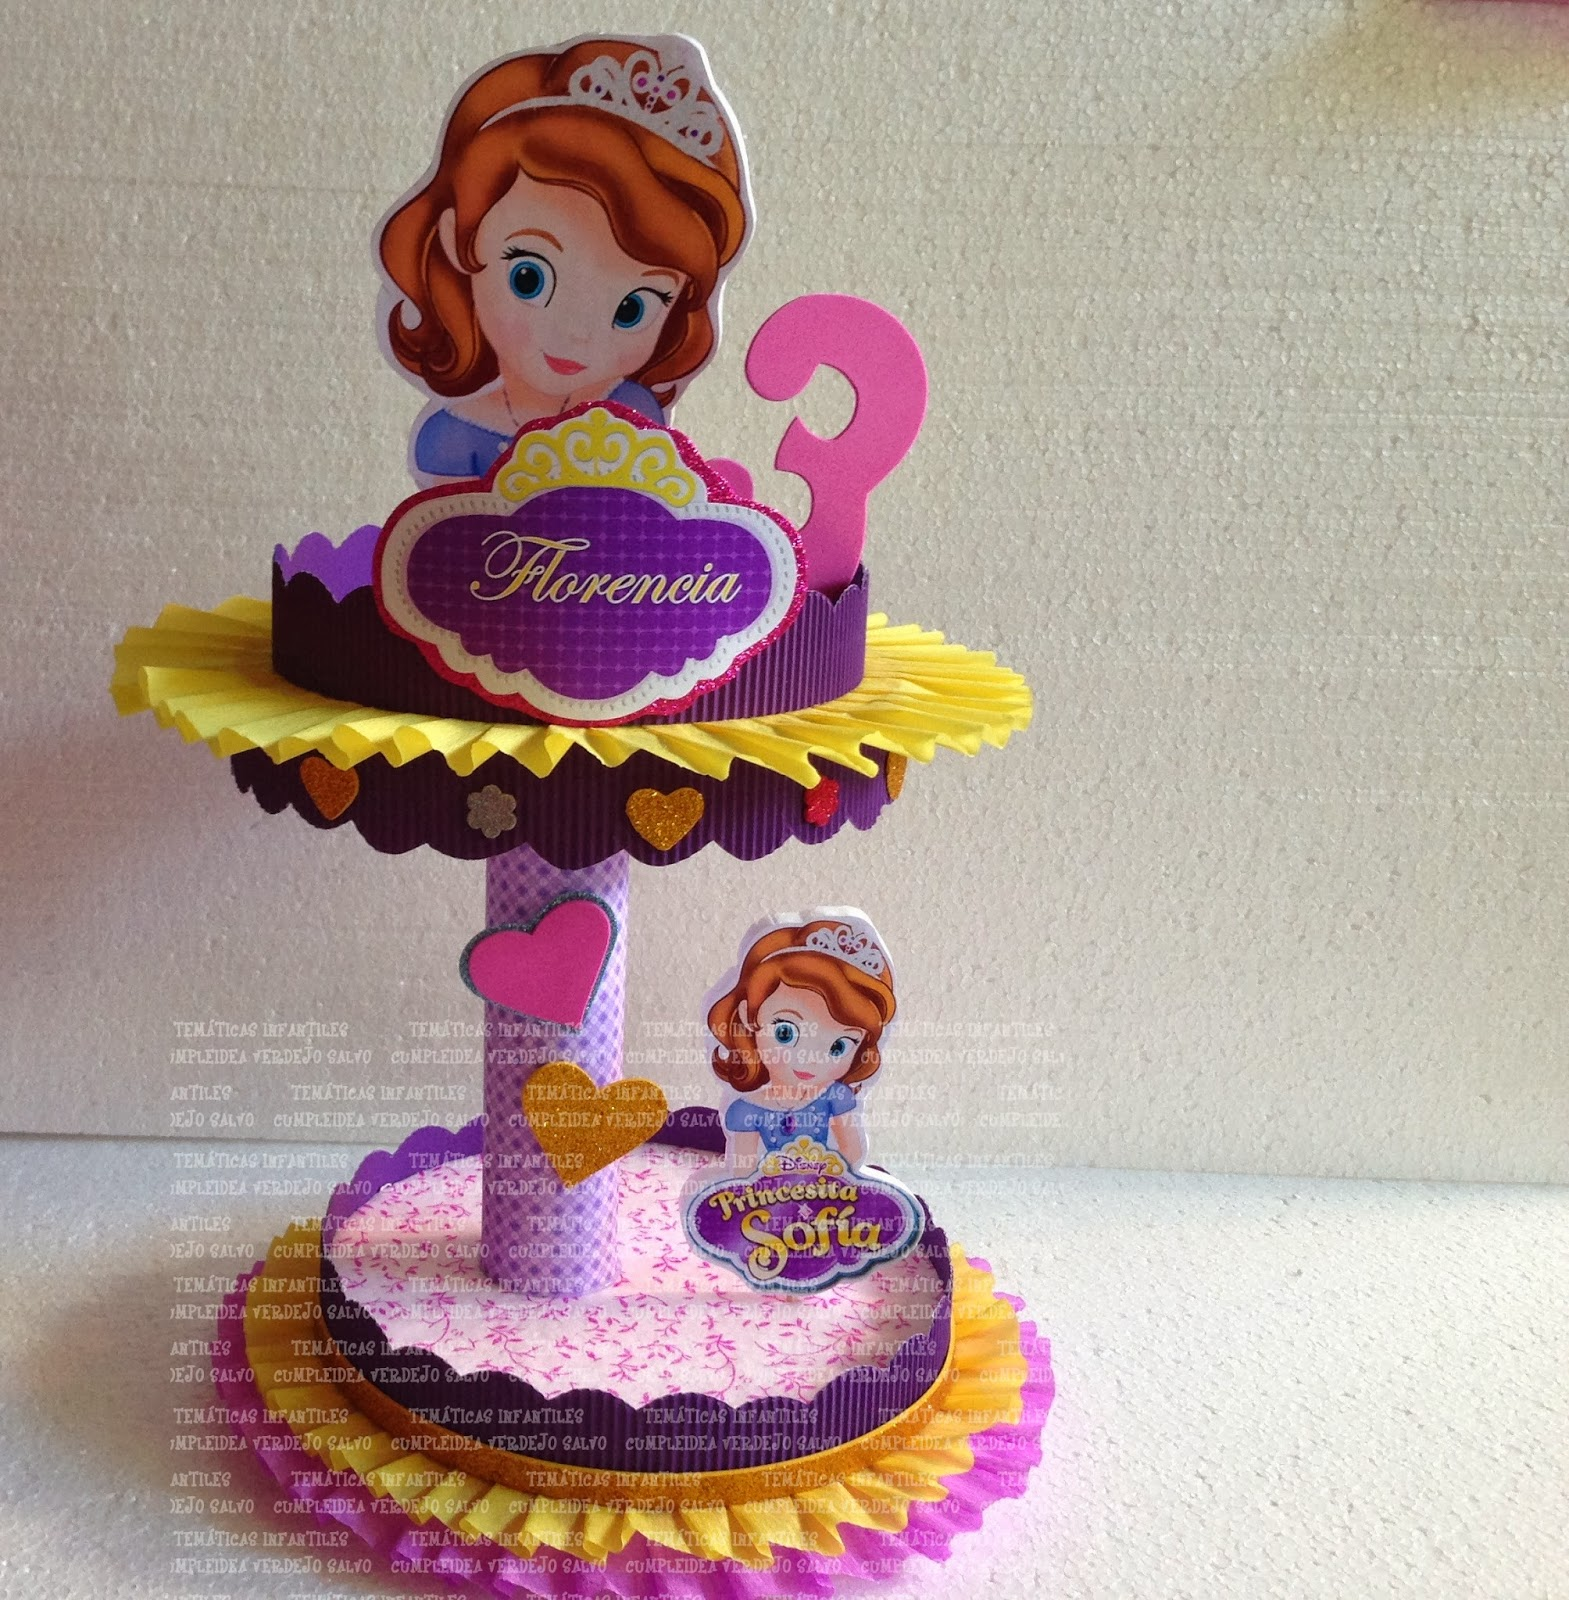 DECORACIONES INFANTILES: princesita sofia